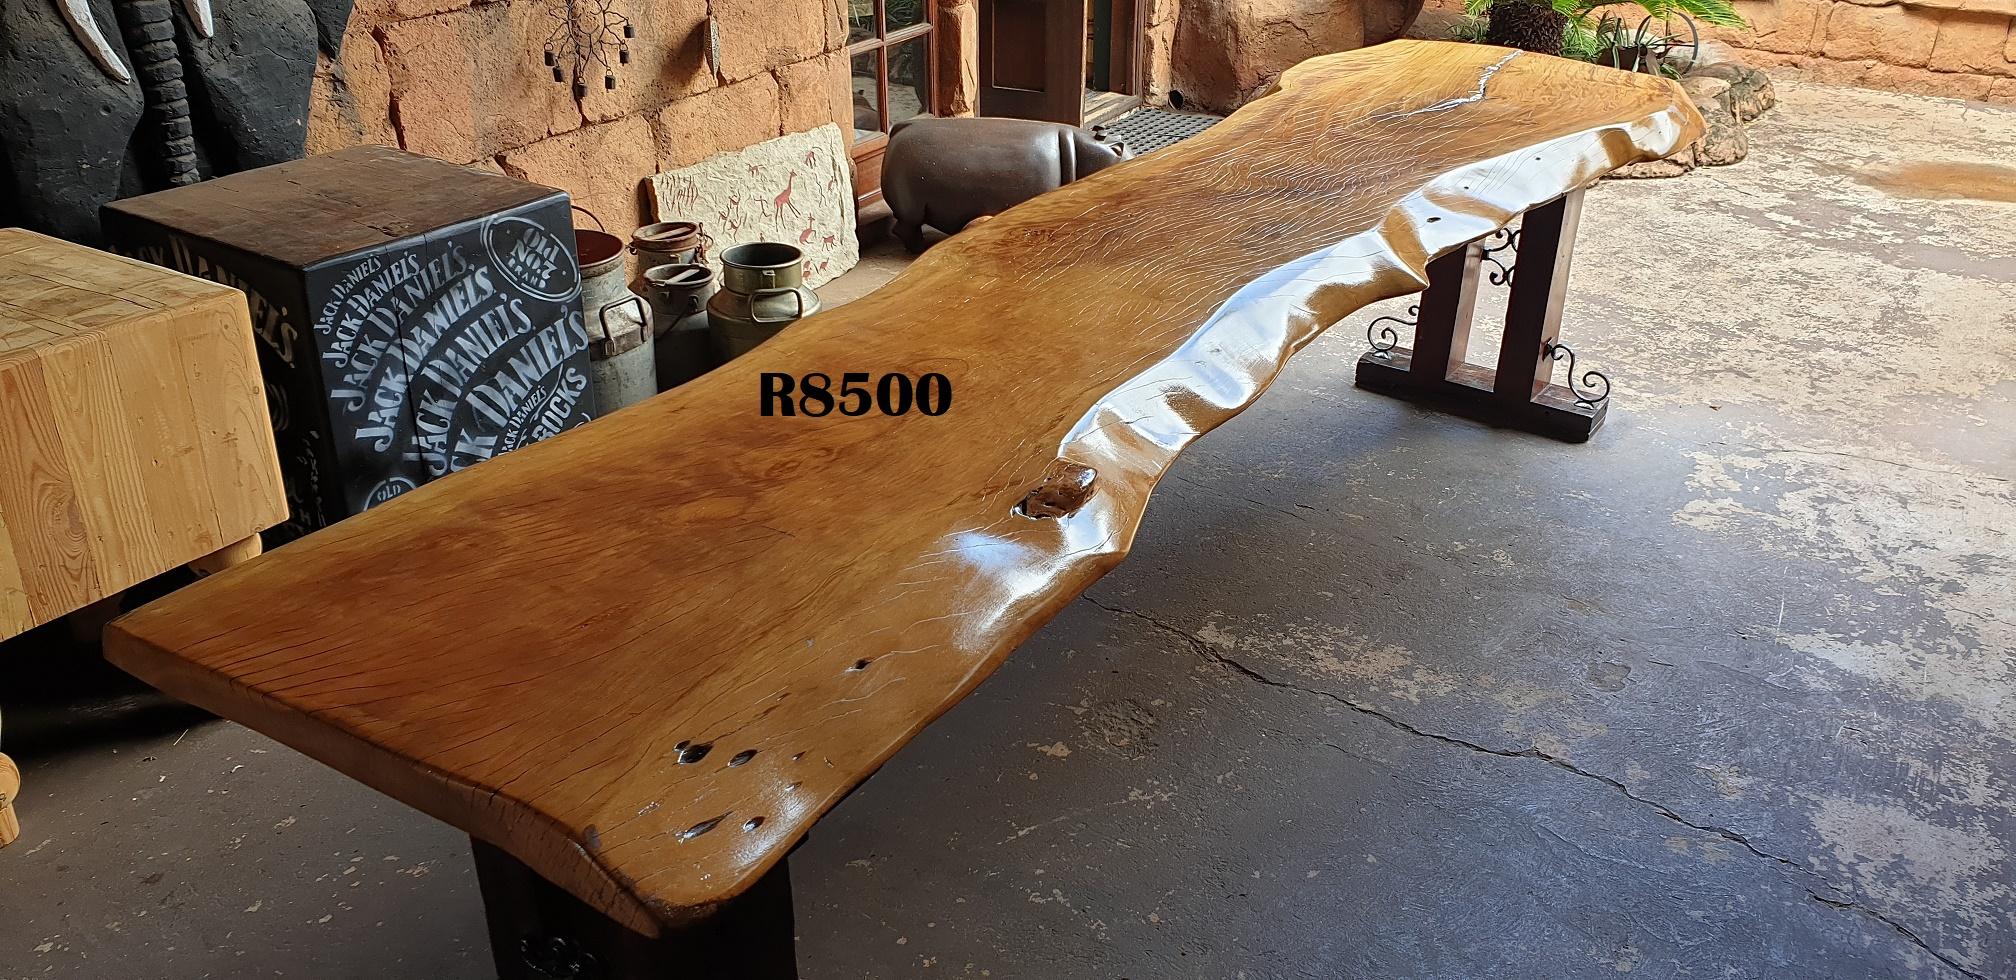 Massive Classique Wooden Slab Table (3460x920x815)